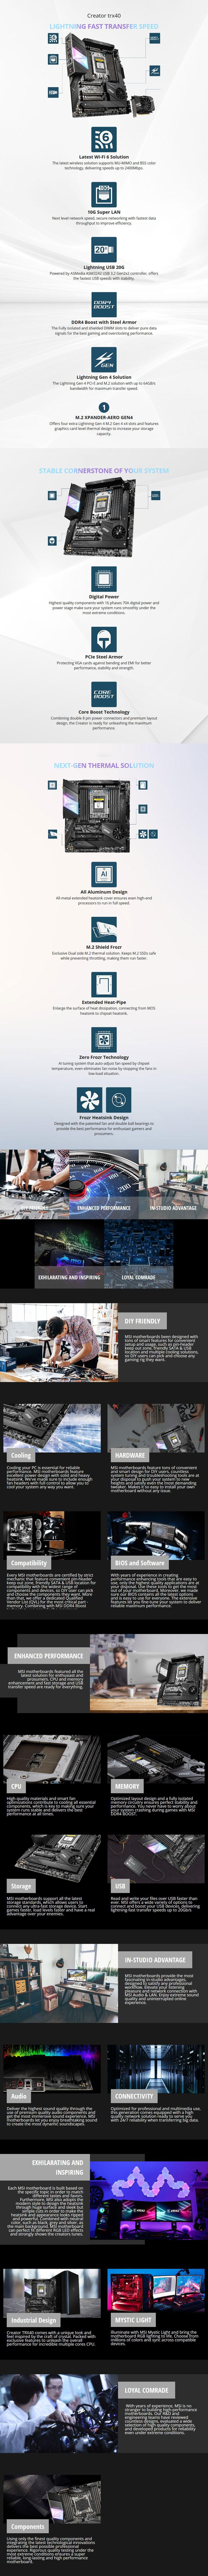 MSI Creator TRX40 sTRX4 E-ATX Motherboard - Overview 1